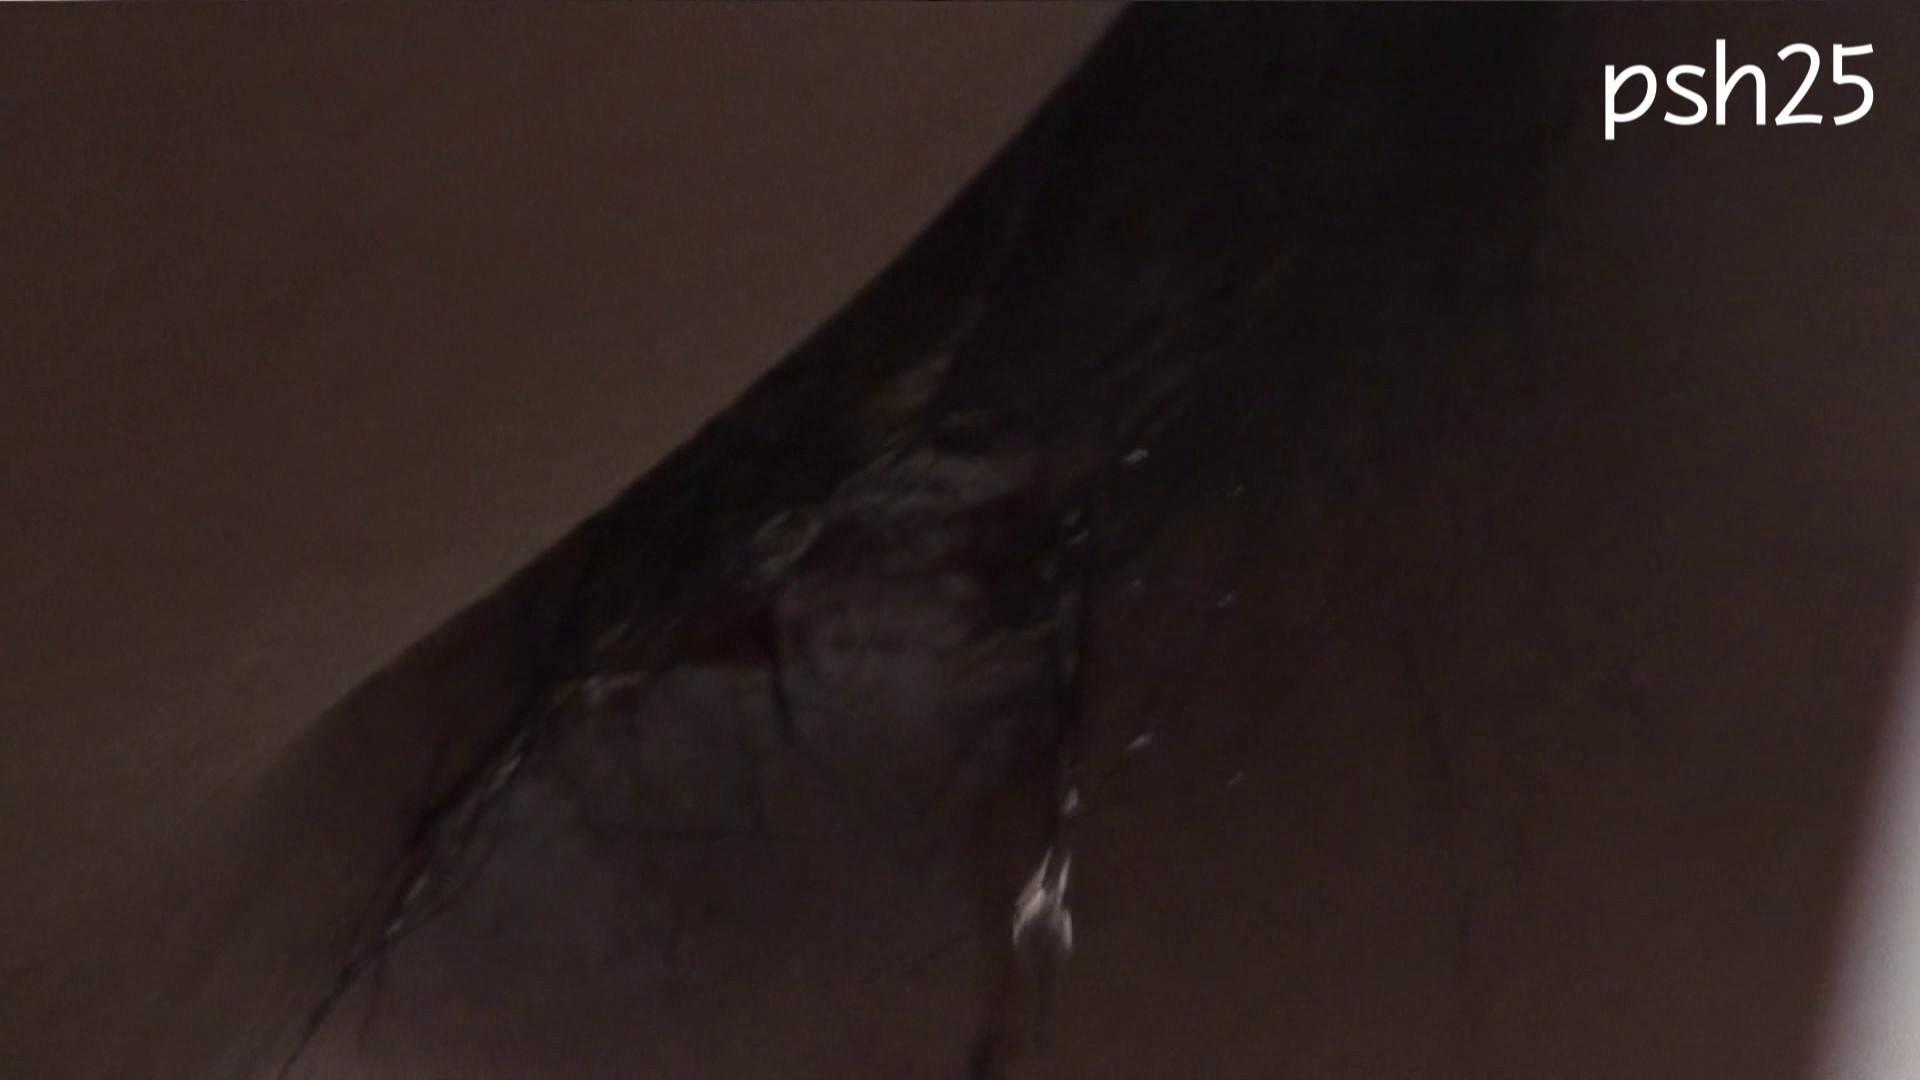 ▲復活限定▲ハイビジョン 盗神伝 Vol.25 盗撮映像大放出  106連発 81